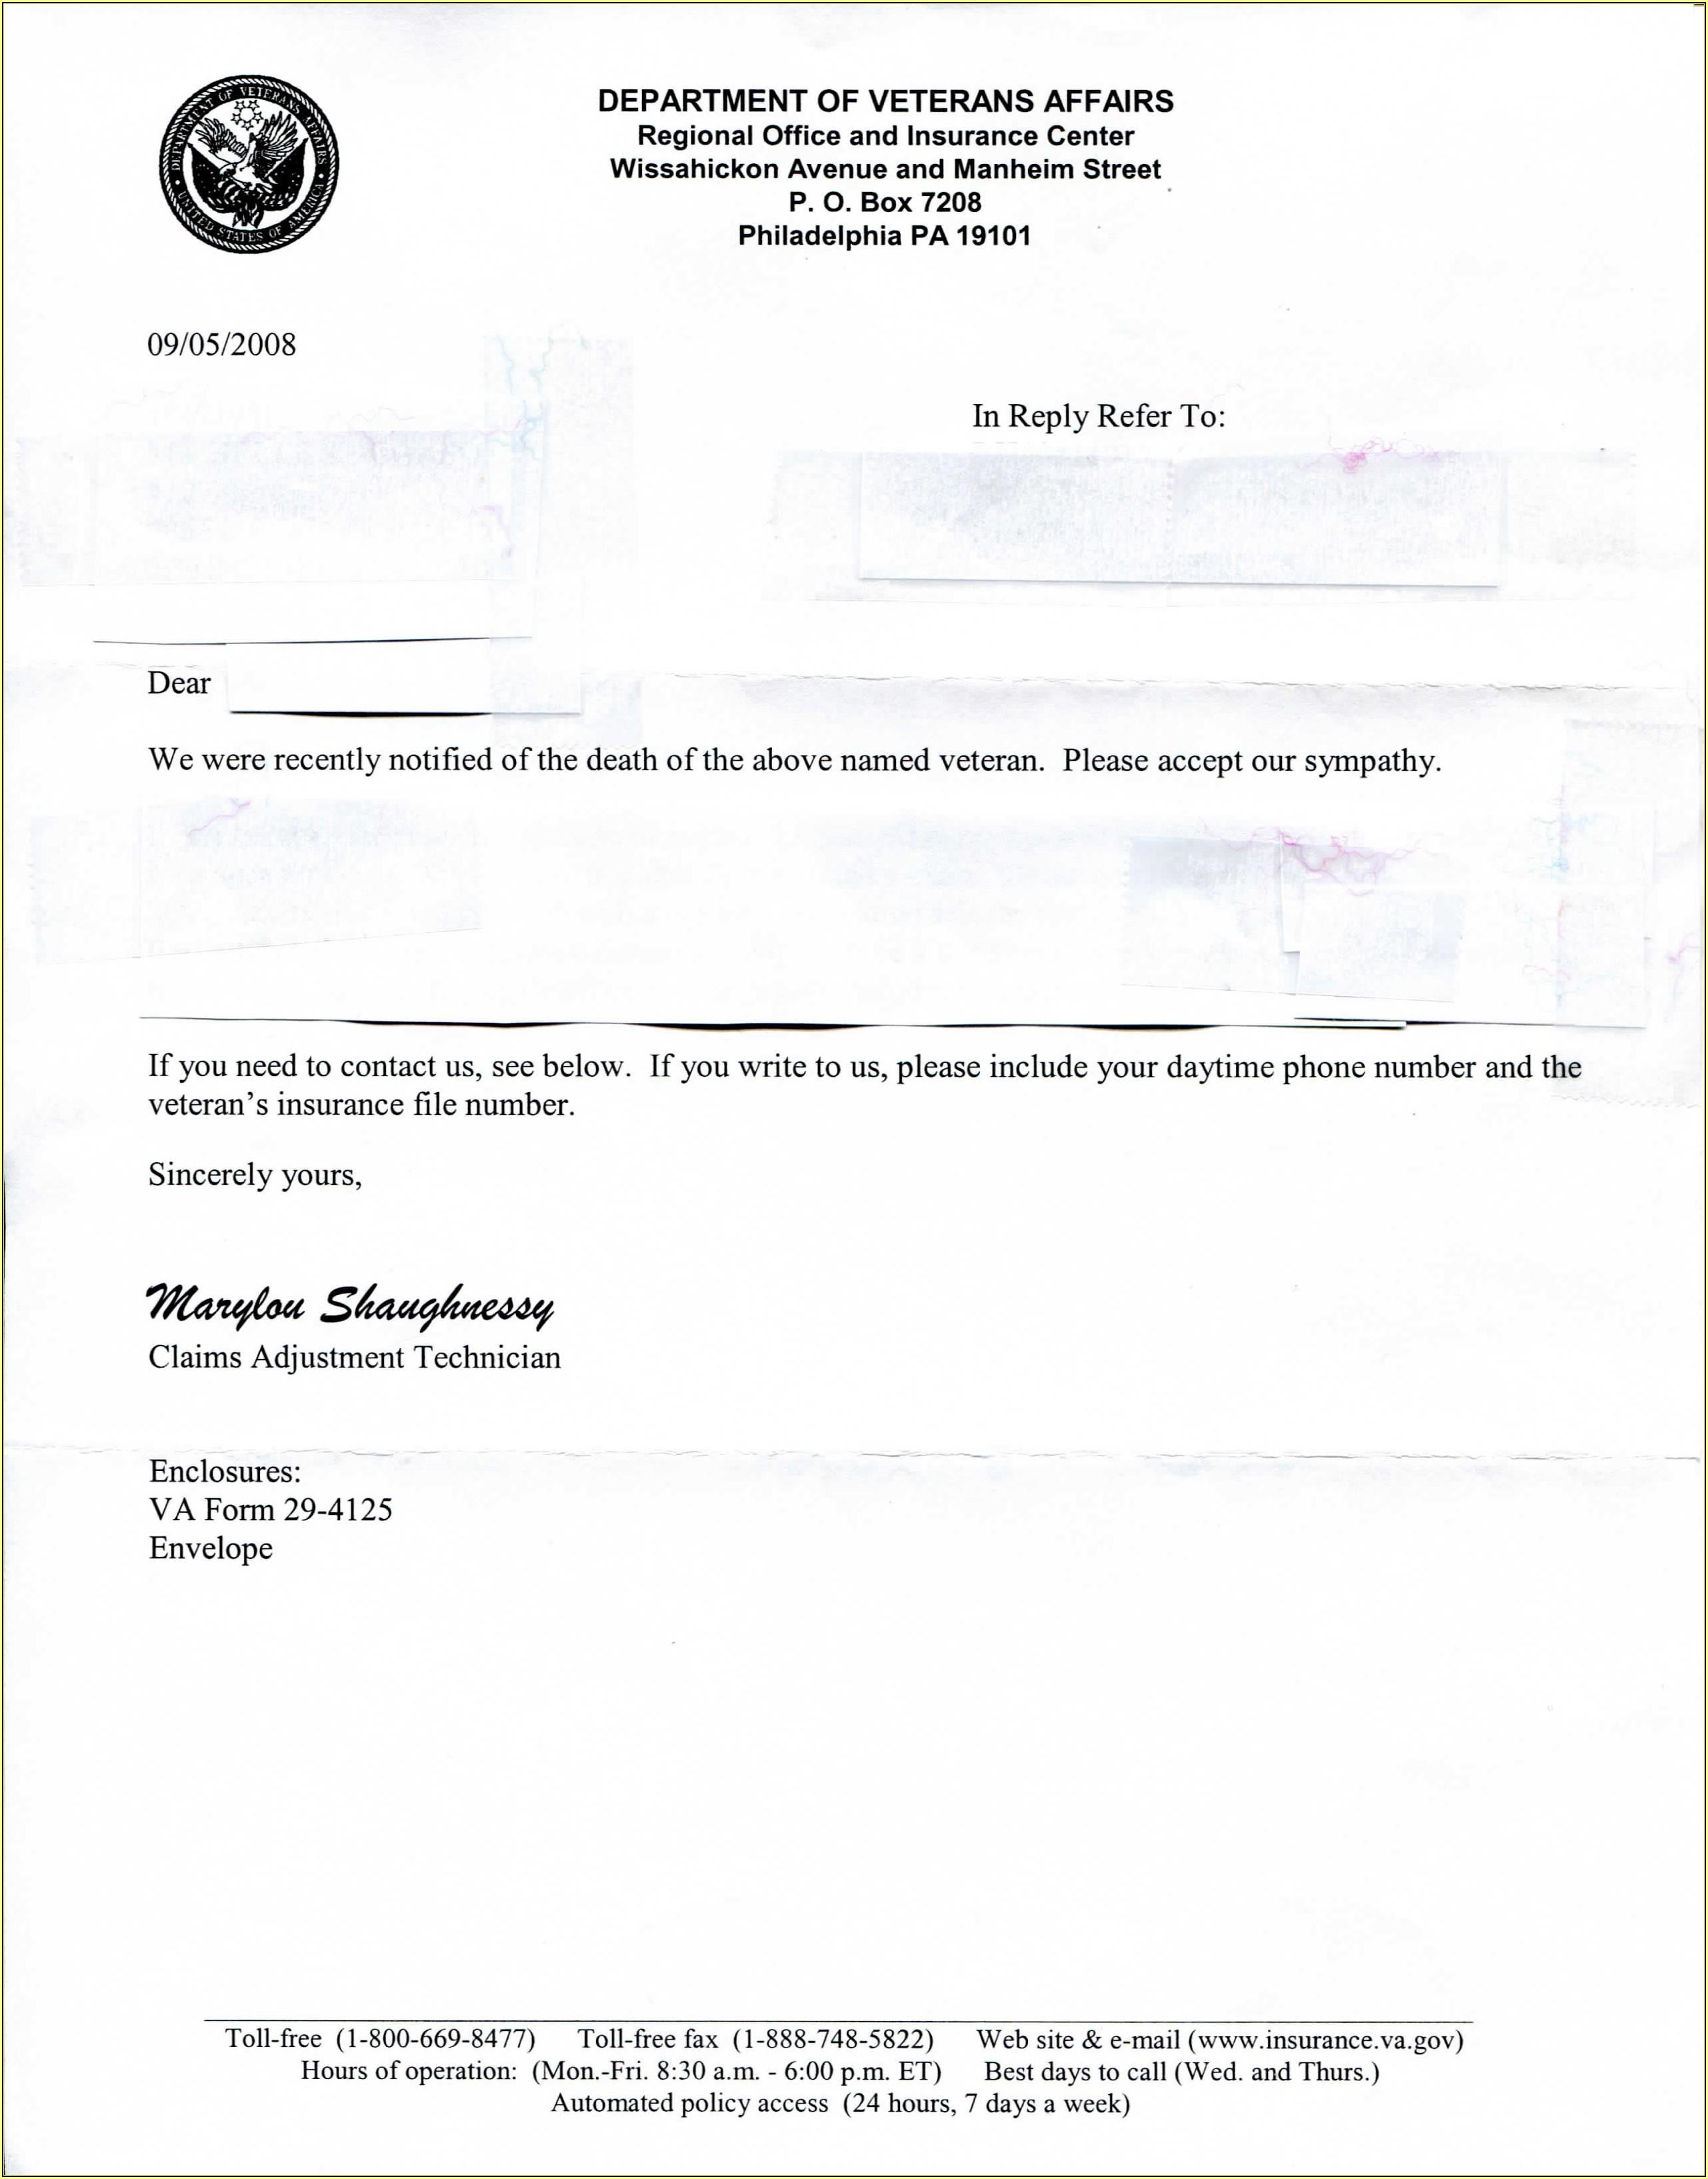 Va Claim Form 29 4125